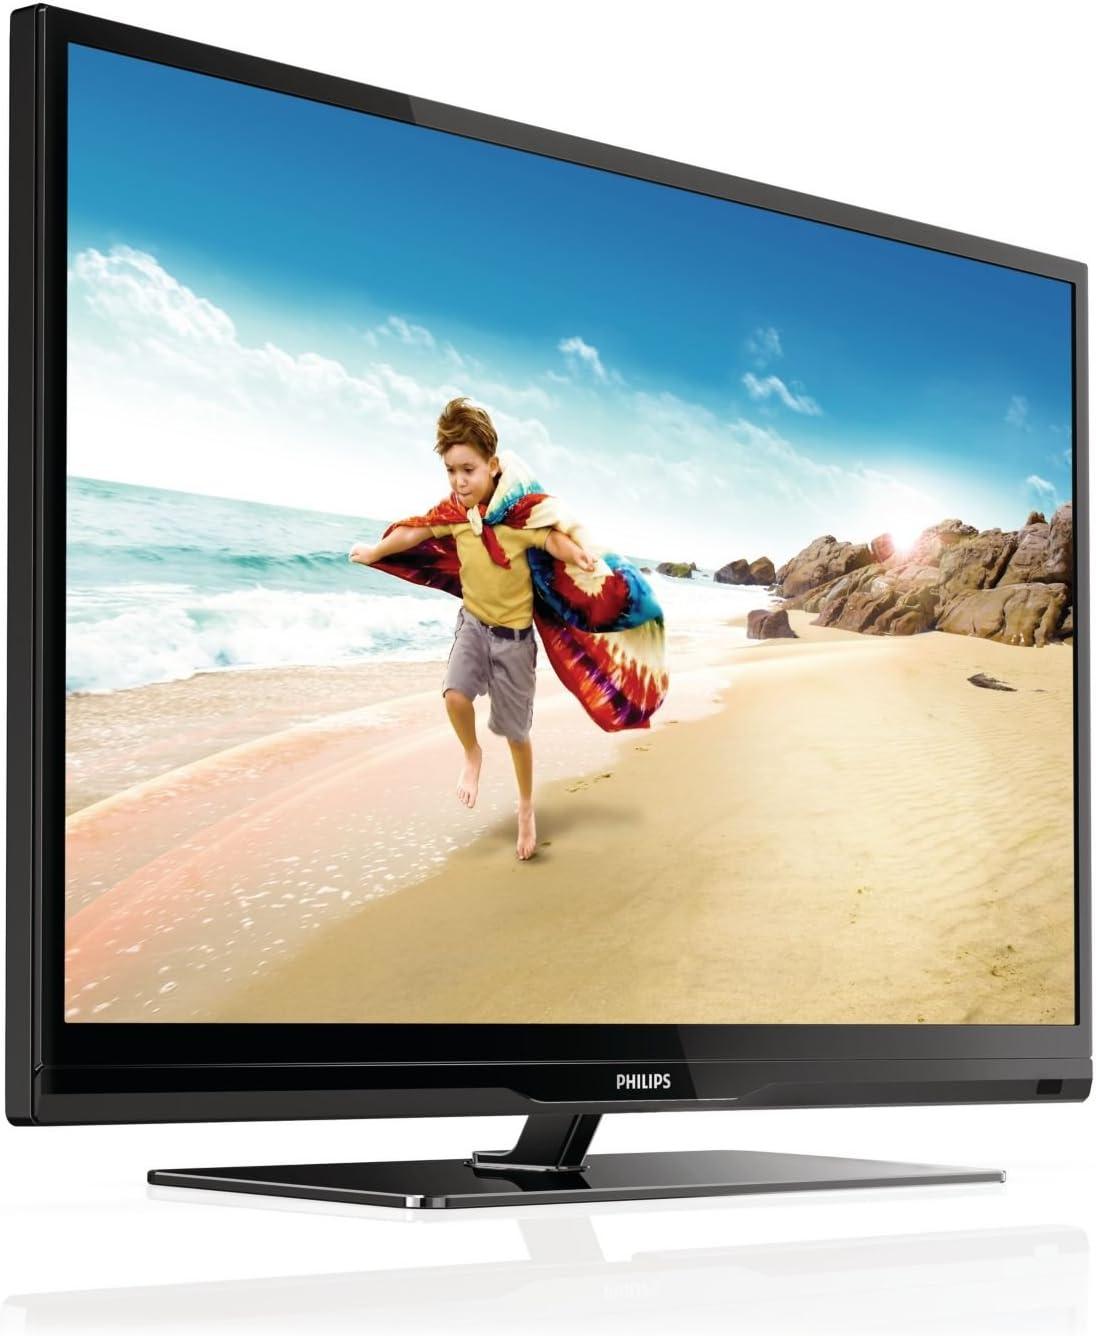 Philips - Televisor Led 46Pfl3807H/12: Amazon.es: Electrónica